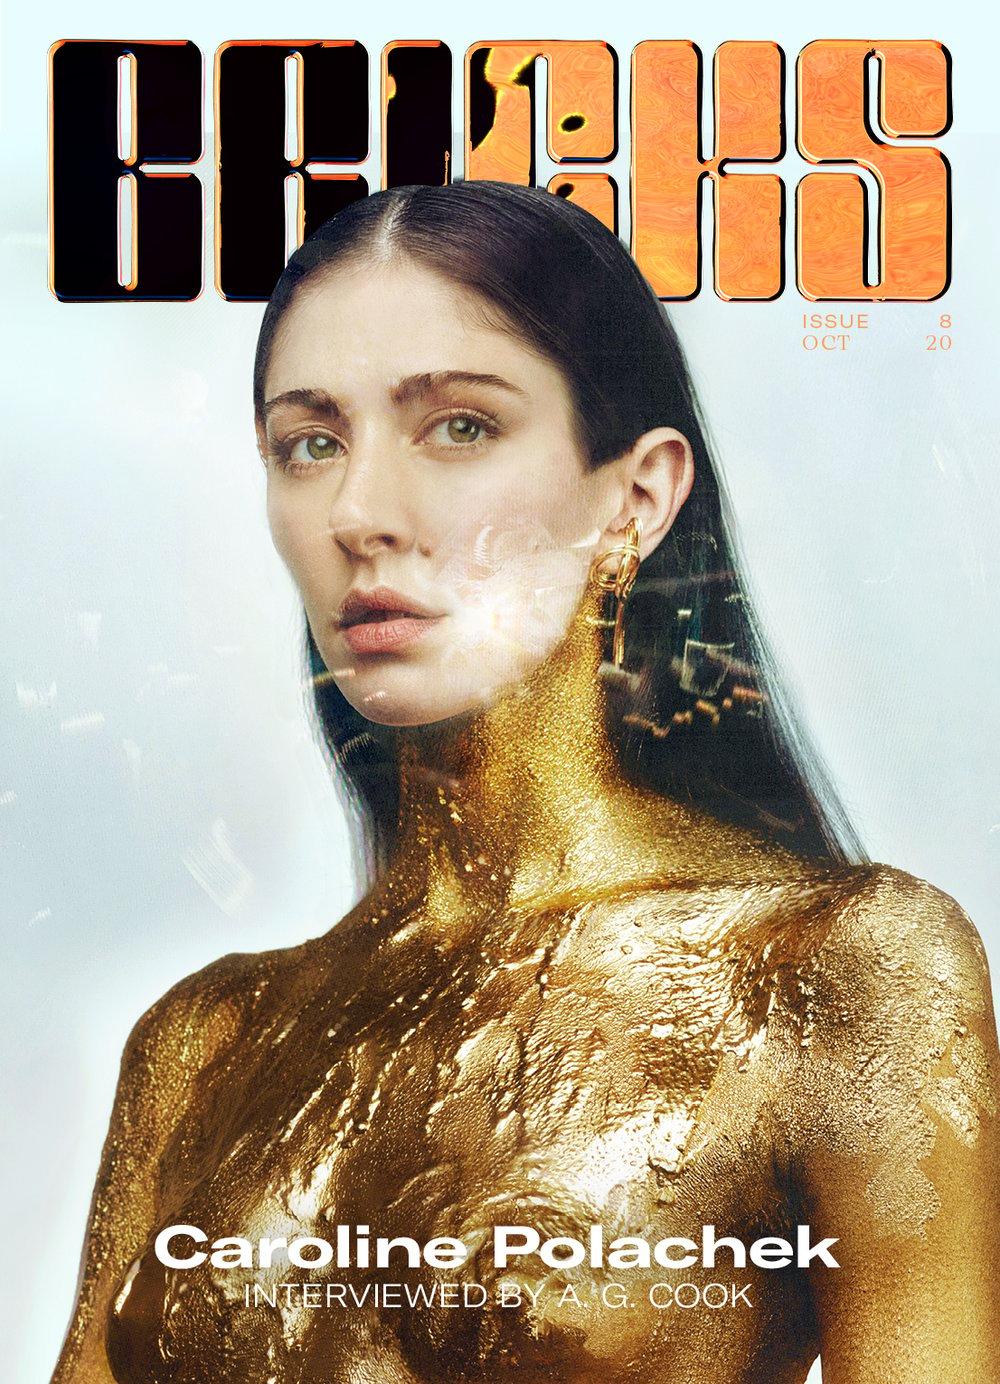 Image of #8 - The Let's Evolve Issue  - Caroline Polachek